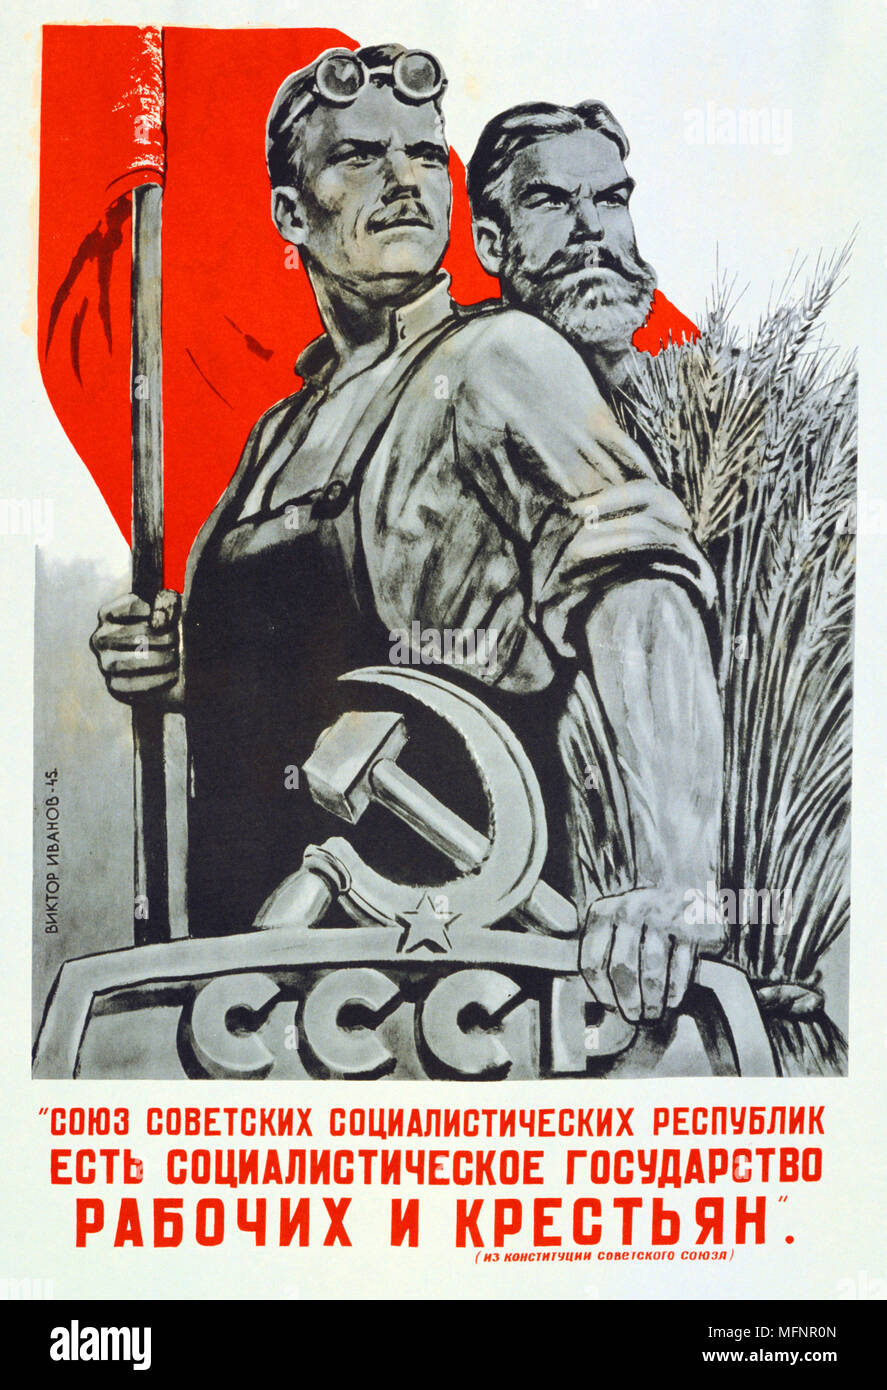 We must work rifle is near Soviet Propaganda Poster USSR Russian Political 1920